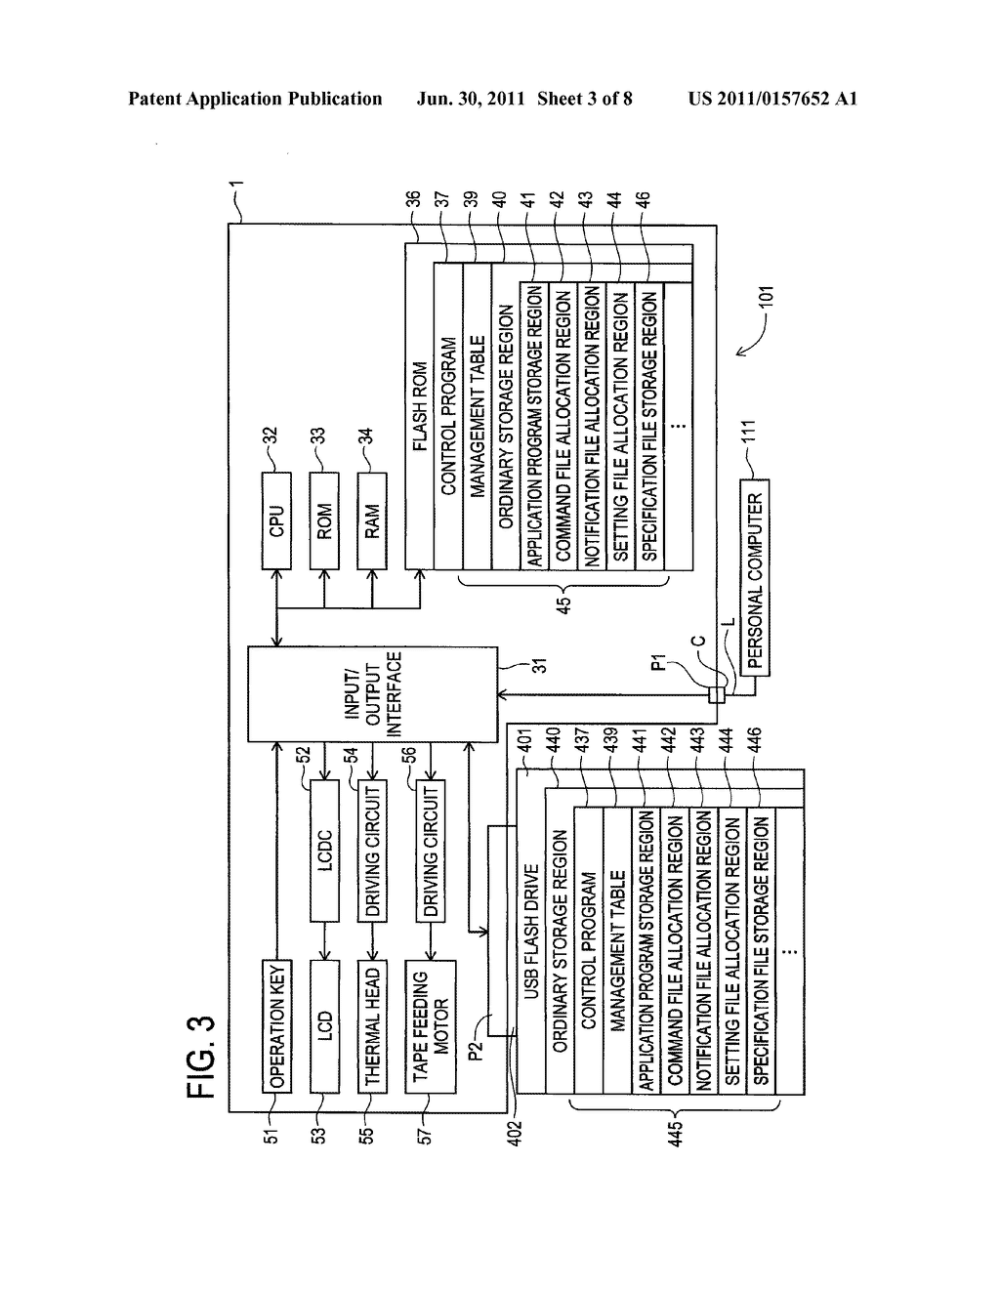 medium resolution of flash drive circuit diagram today wiring diagramusb stick wiring diagram wiring diagram motherboard circuit diagram flash